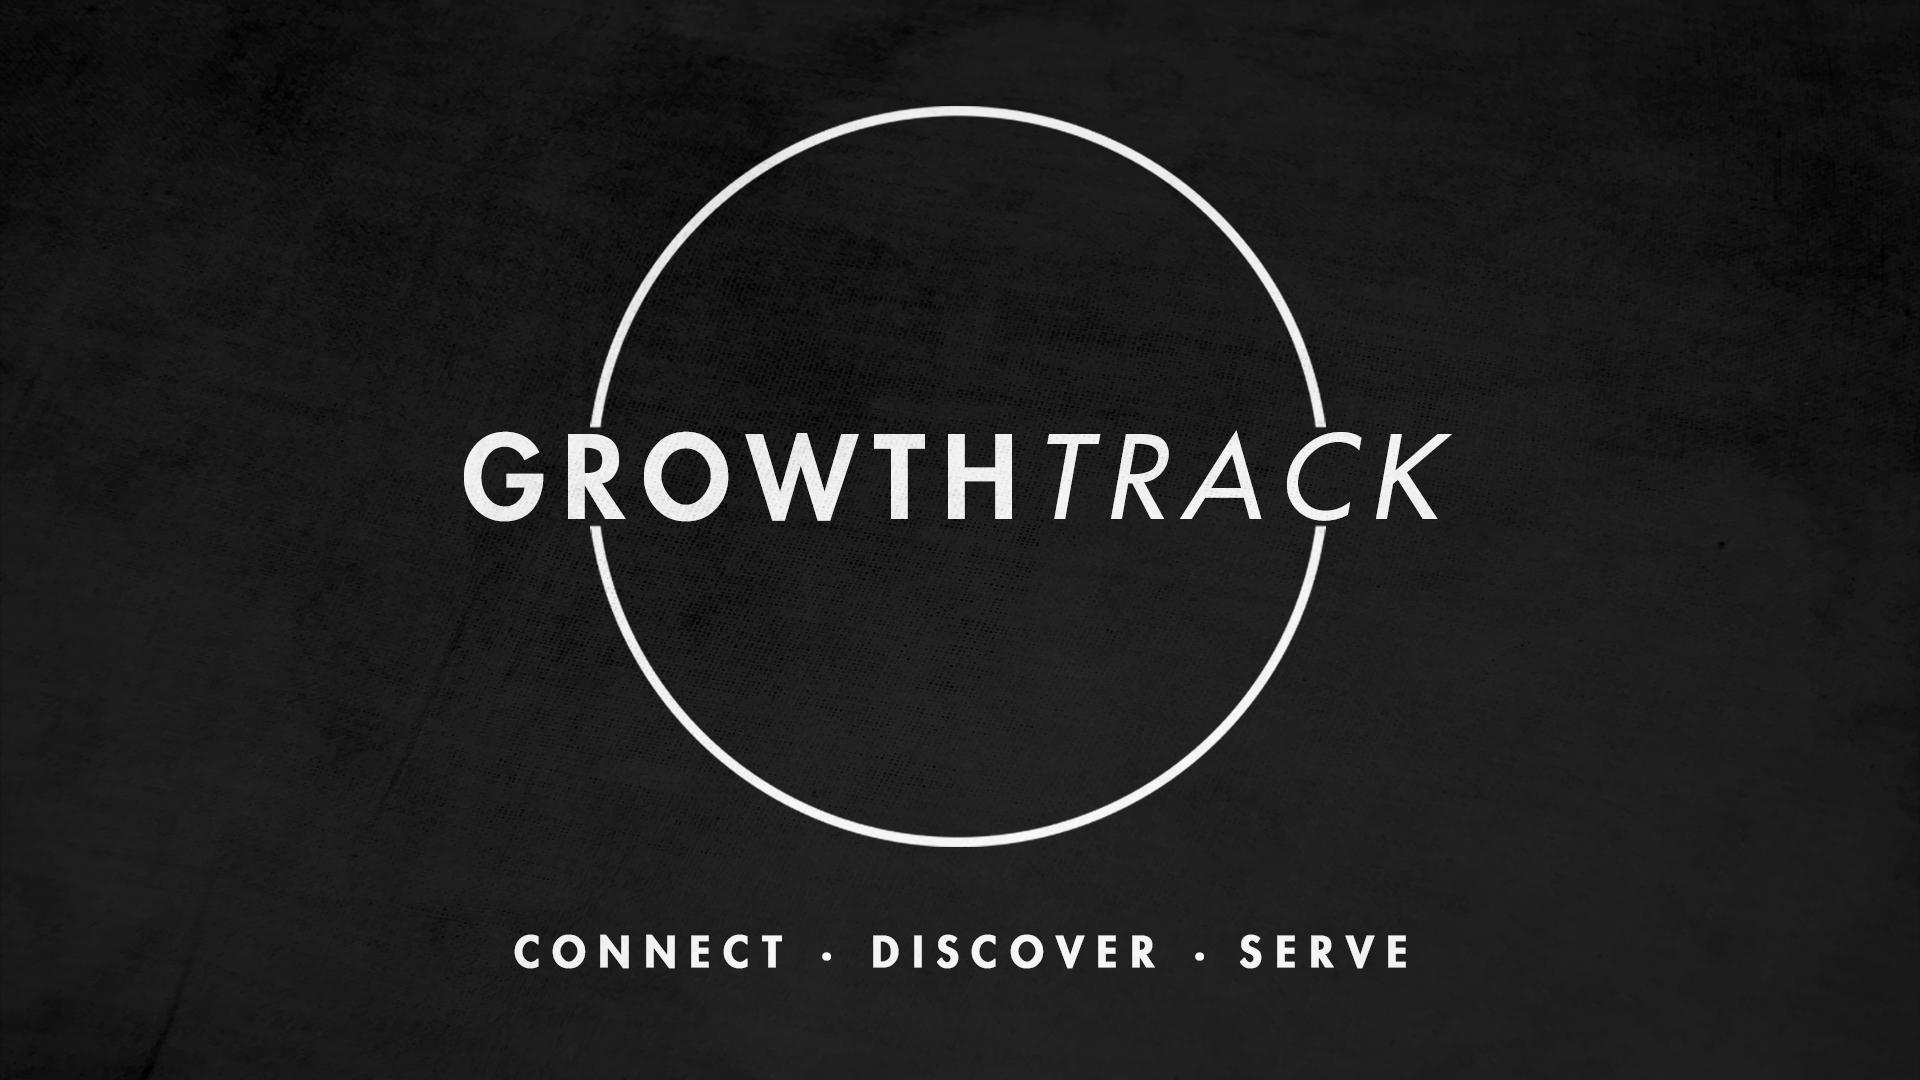 growth track slide.JPG